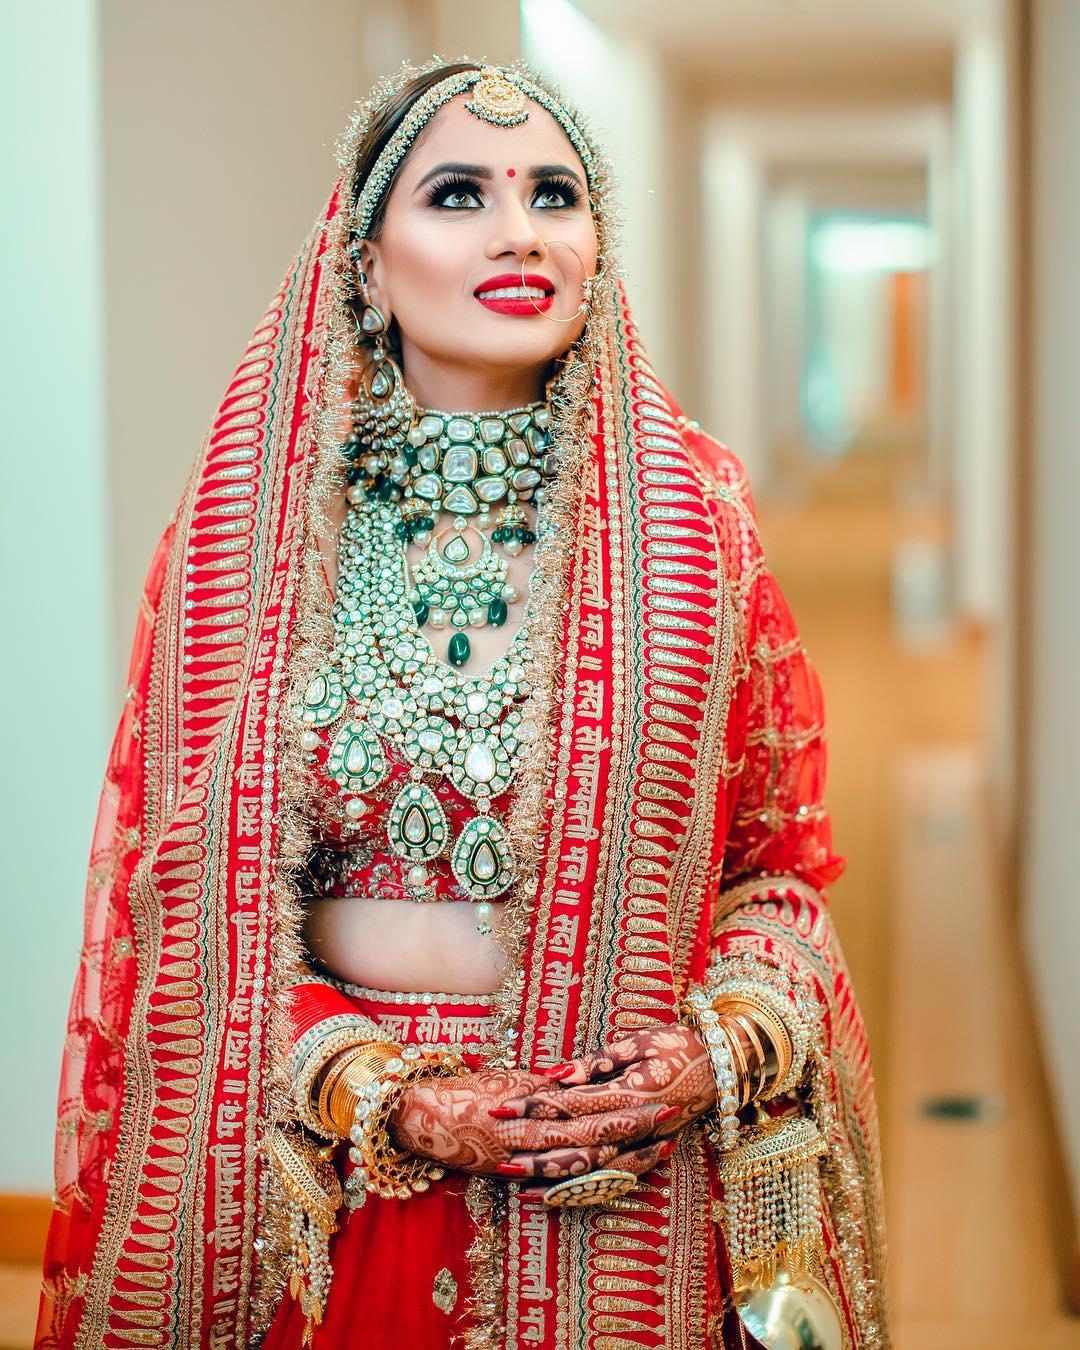 Deepika Padukone's bridal look